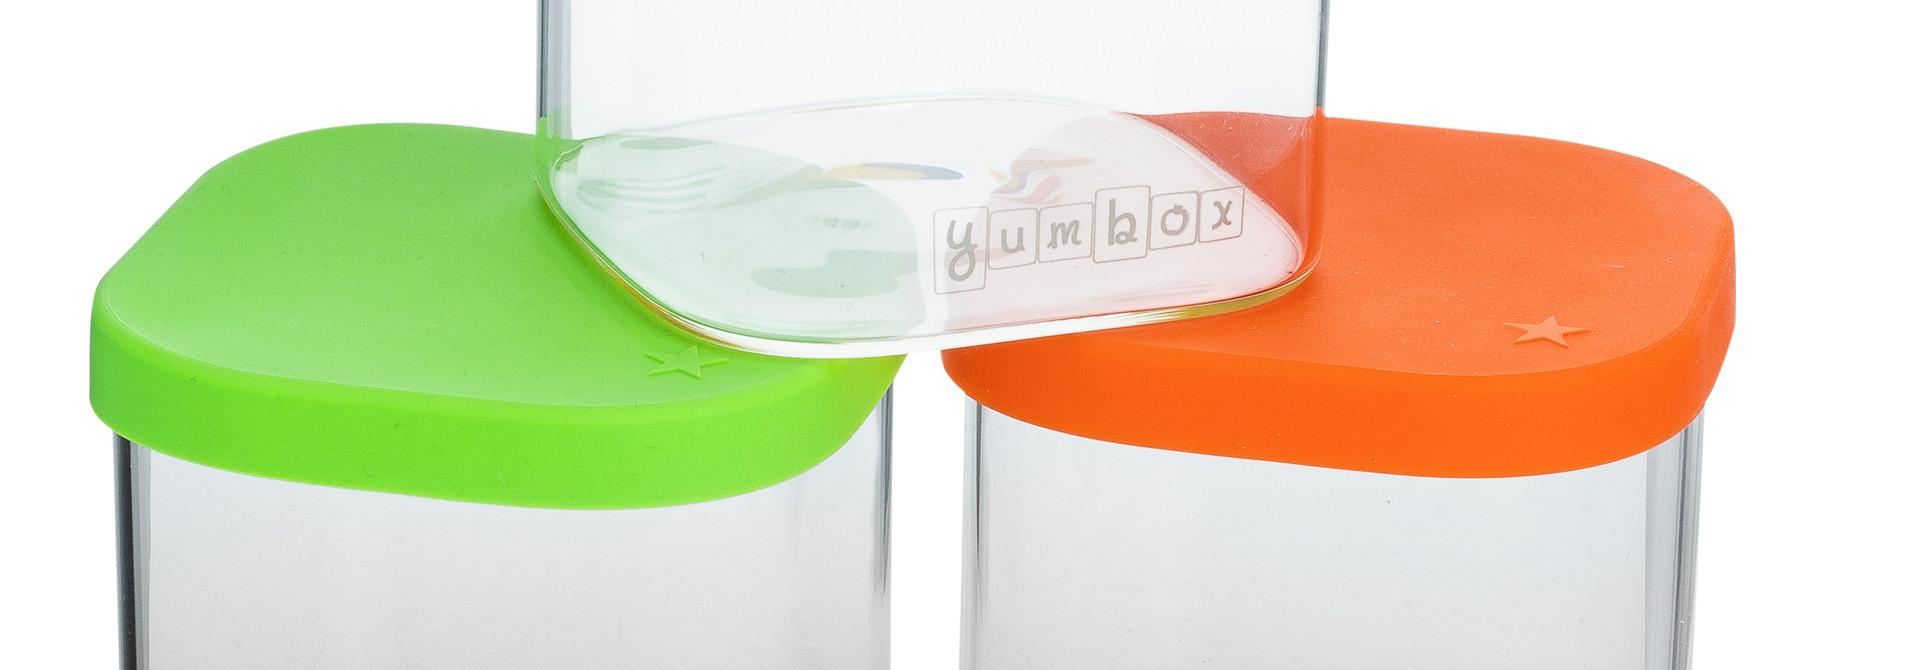 Yumbox Chop Chop 3 glass cubes Vibrant